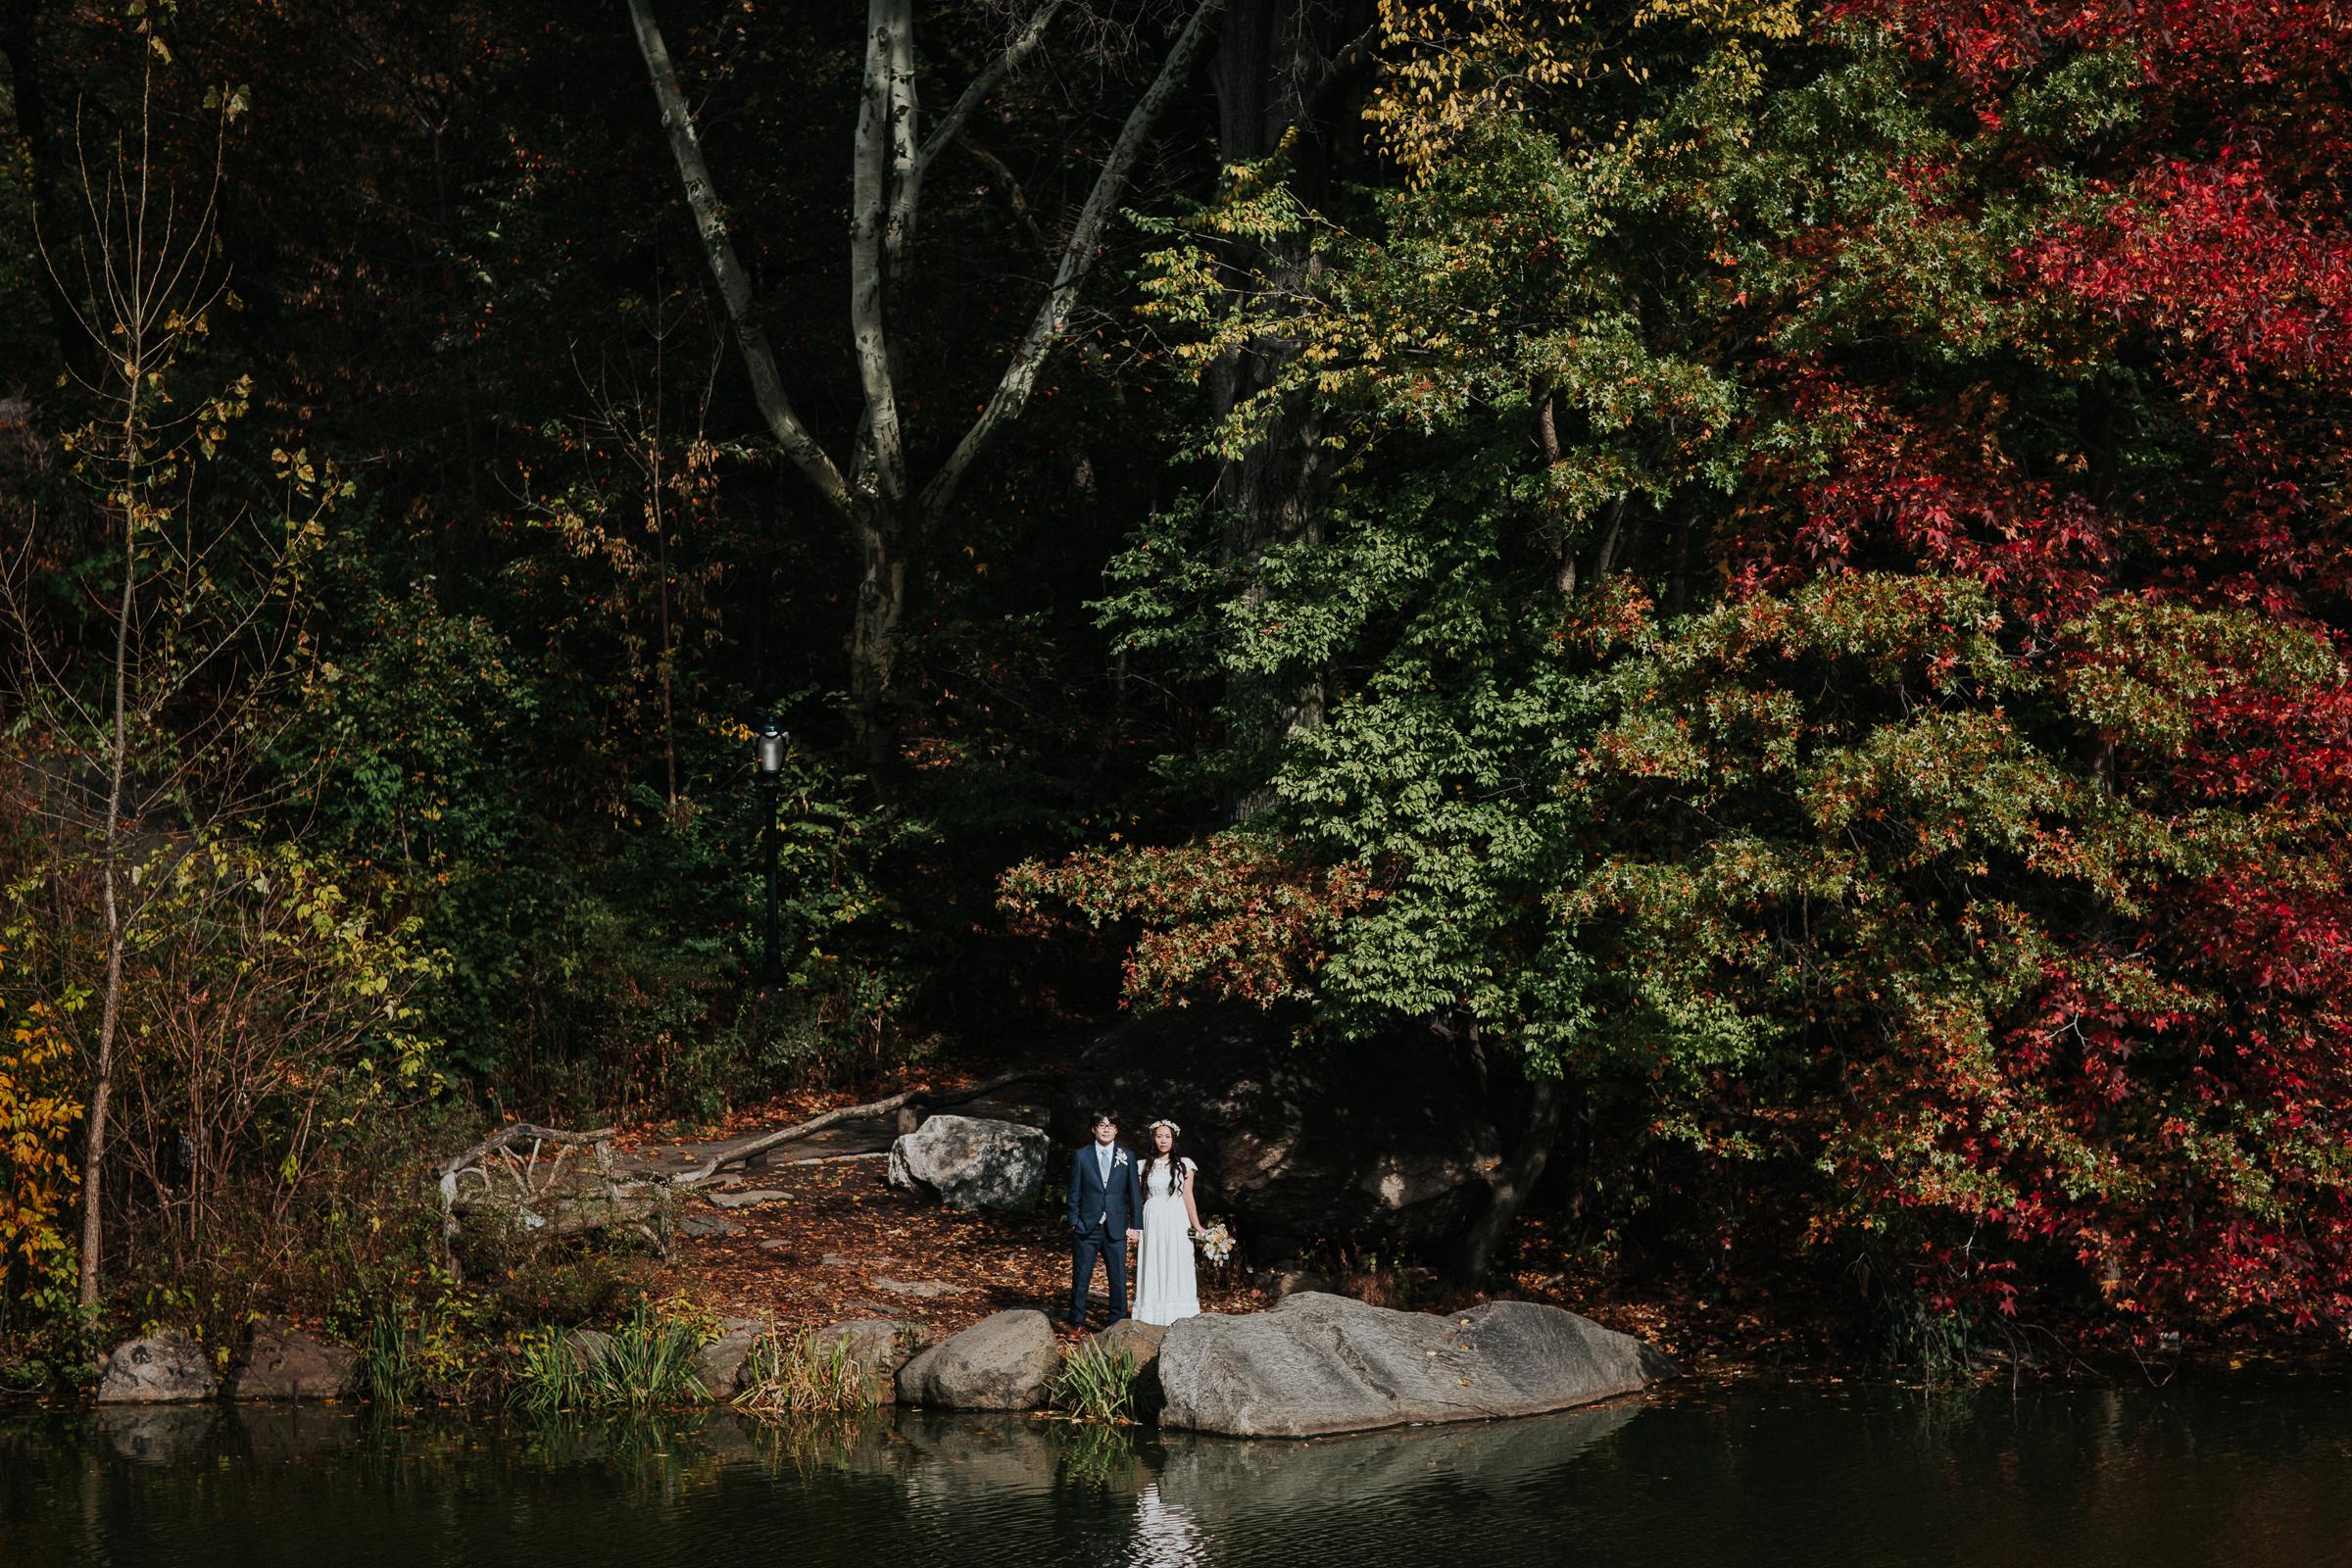 New-York-Documentary-Wedding-Photography-Best-Of-2017-by-Elvira-Kalviste-Photography-128.jpg